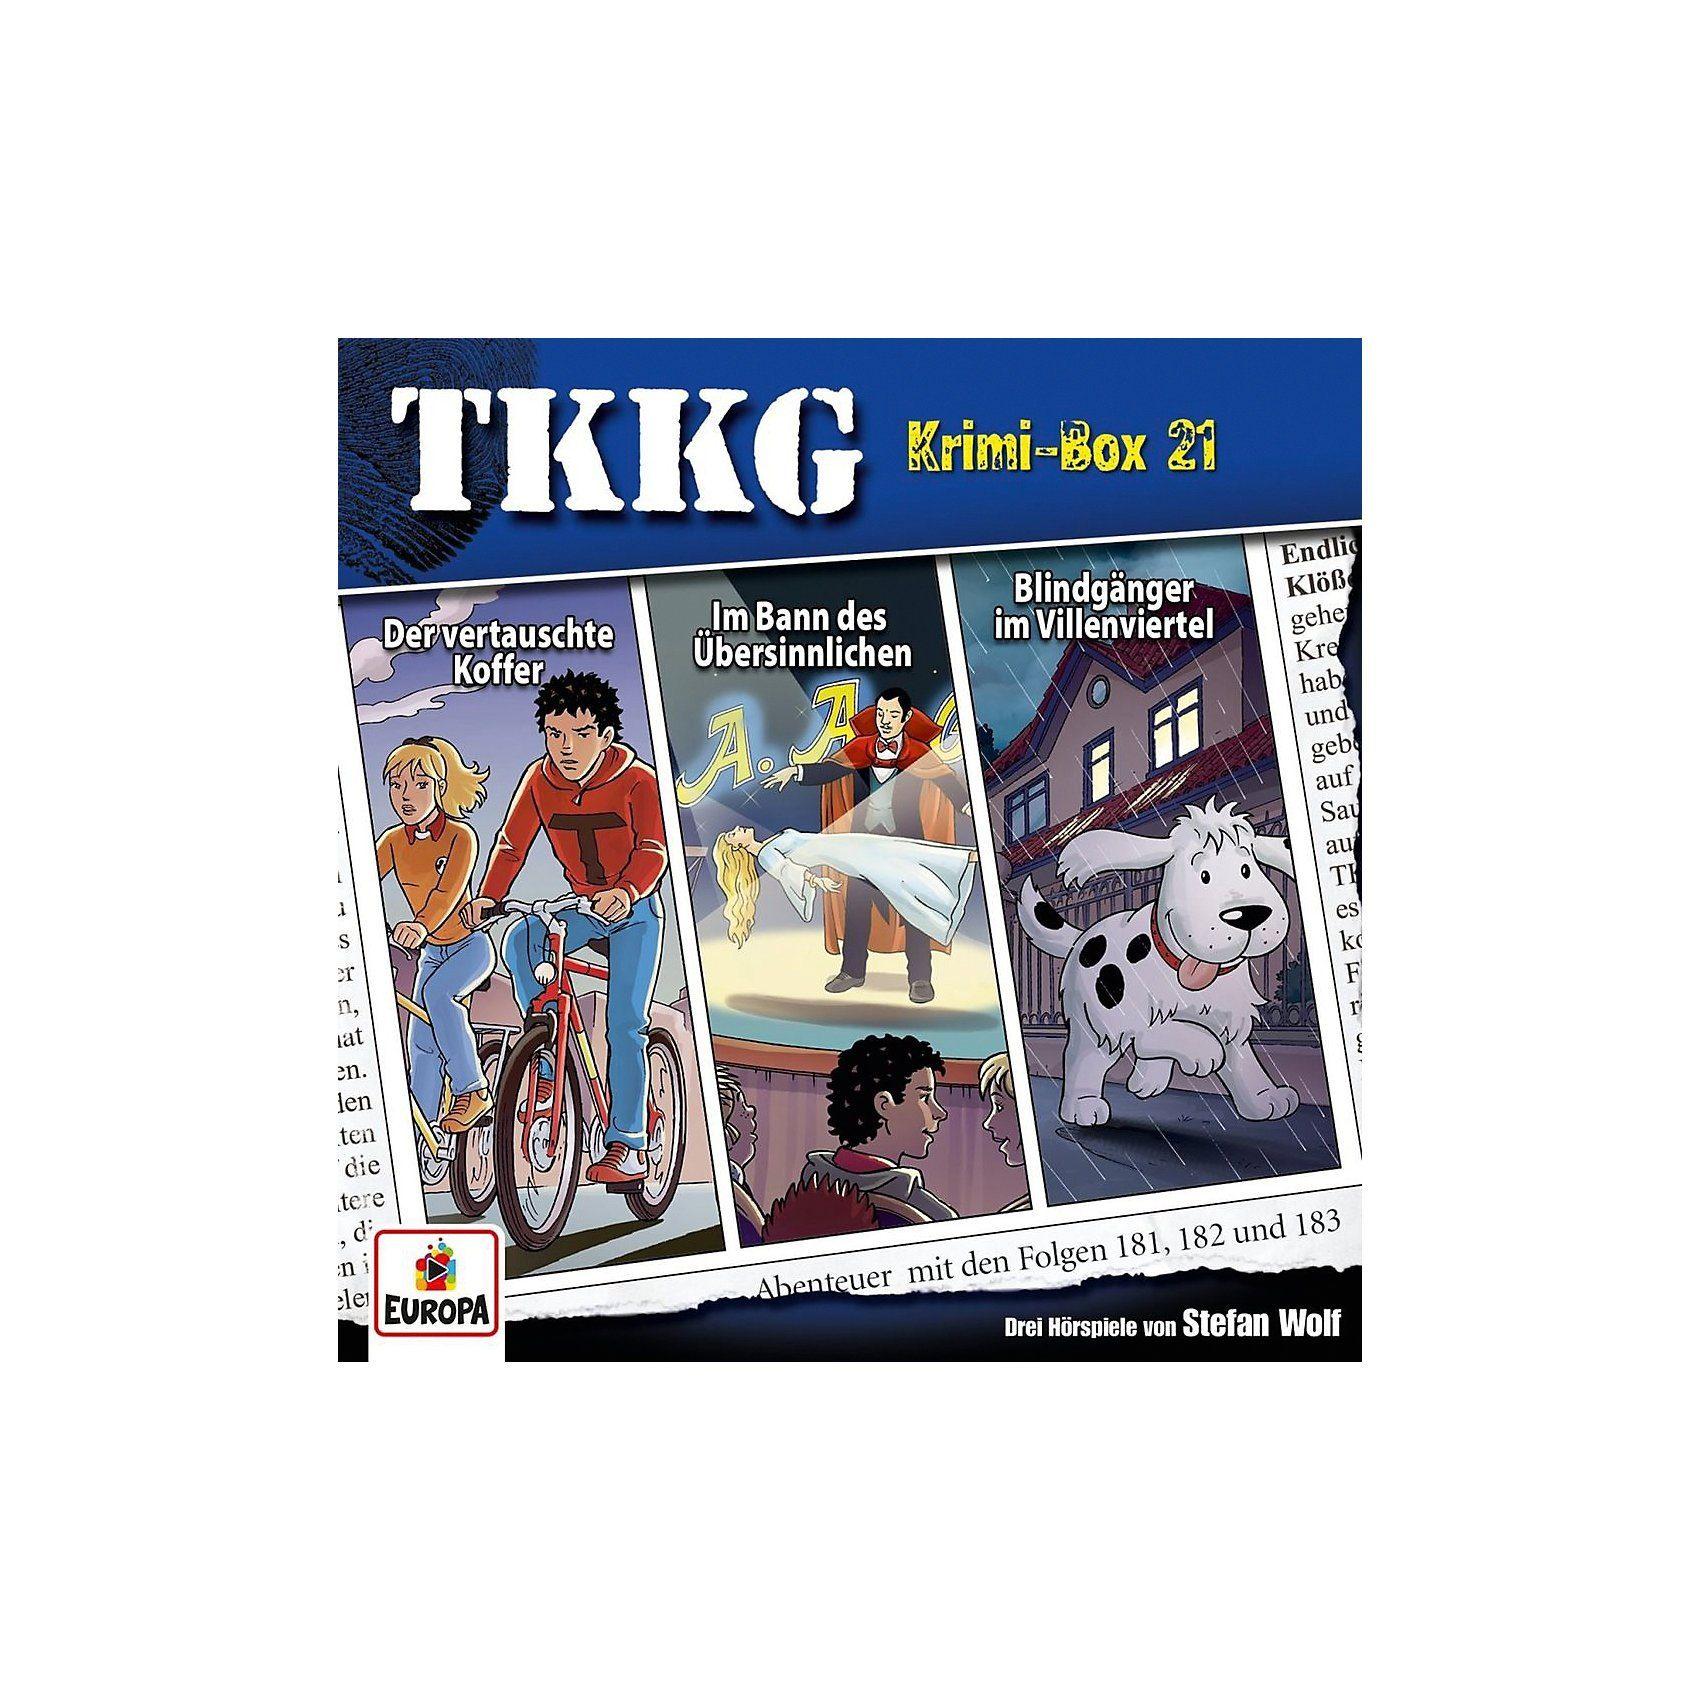 Sony CD Tkkg Krimi-Box 21 (Folgen 181,182,183) (3 CDs)